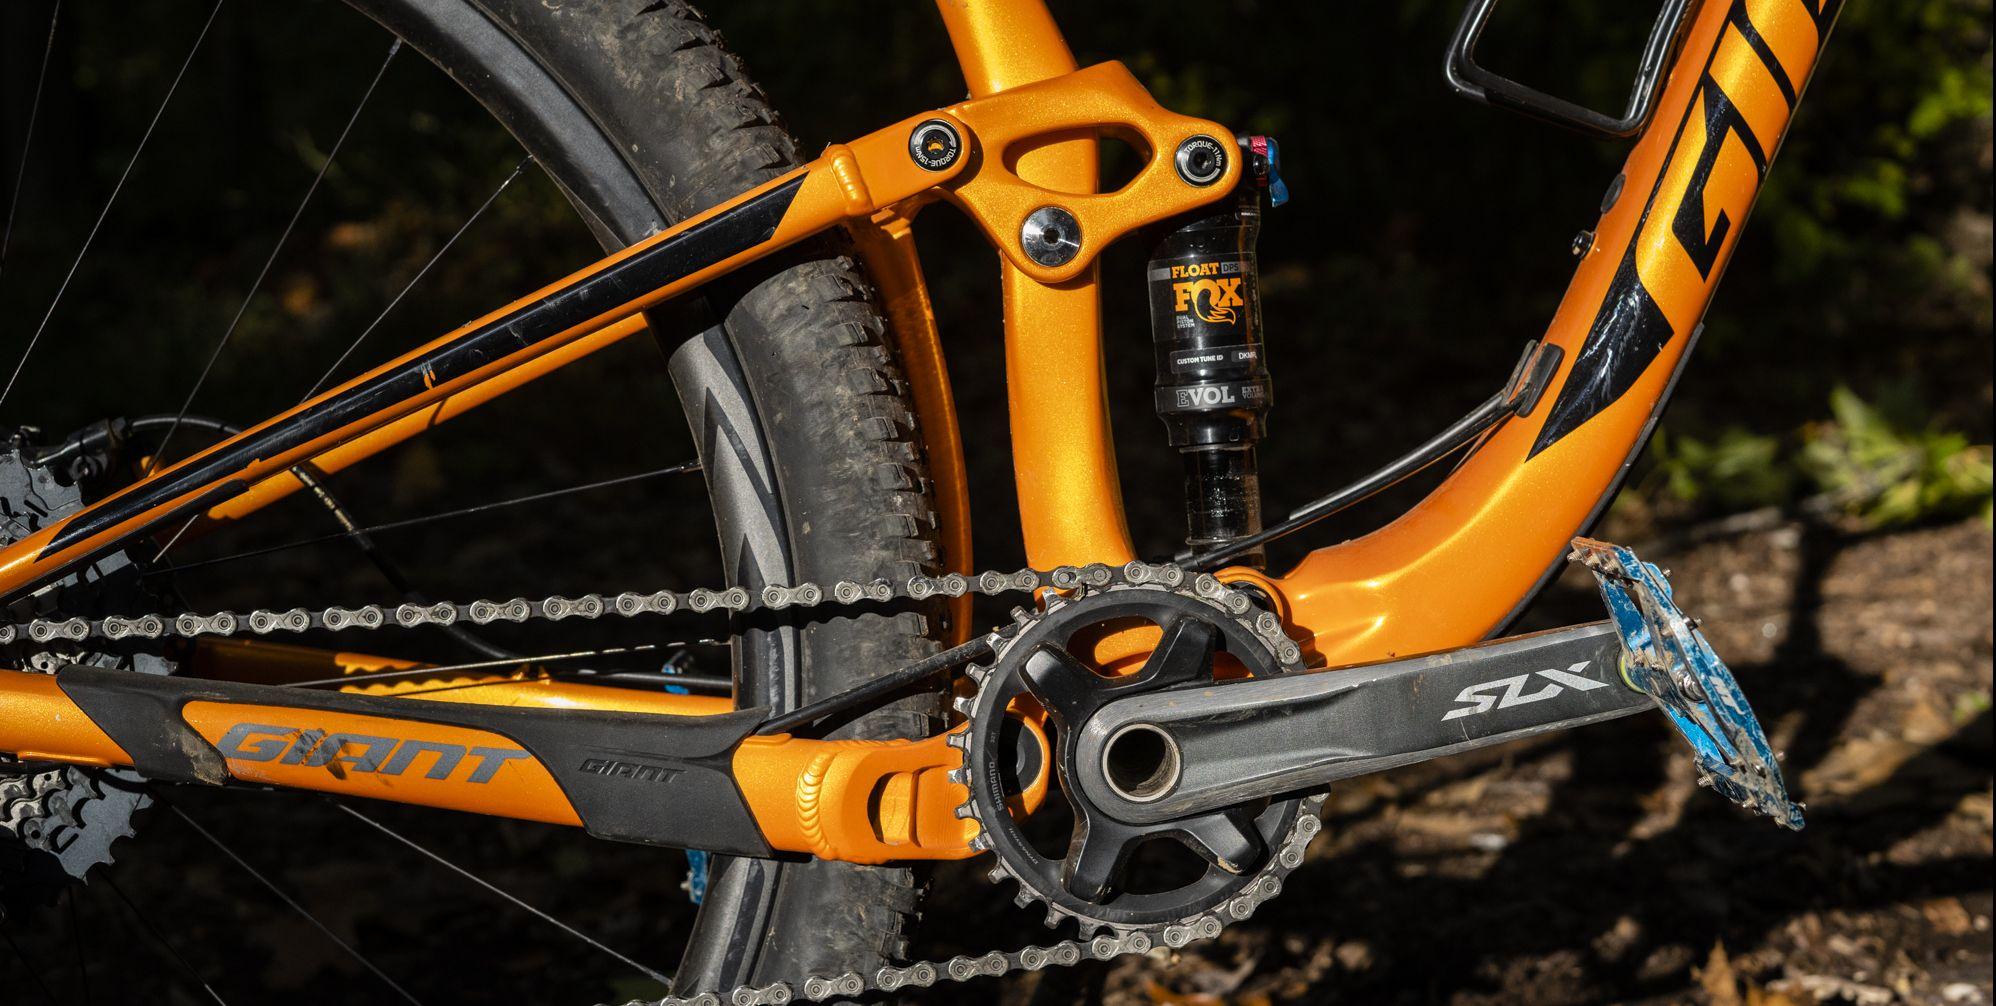 Giant Anthem Advanced 29 - Mountain Bike Review